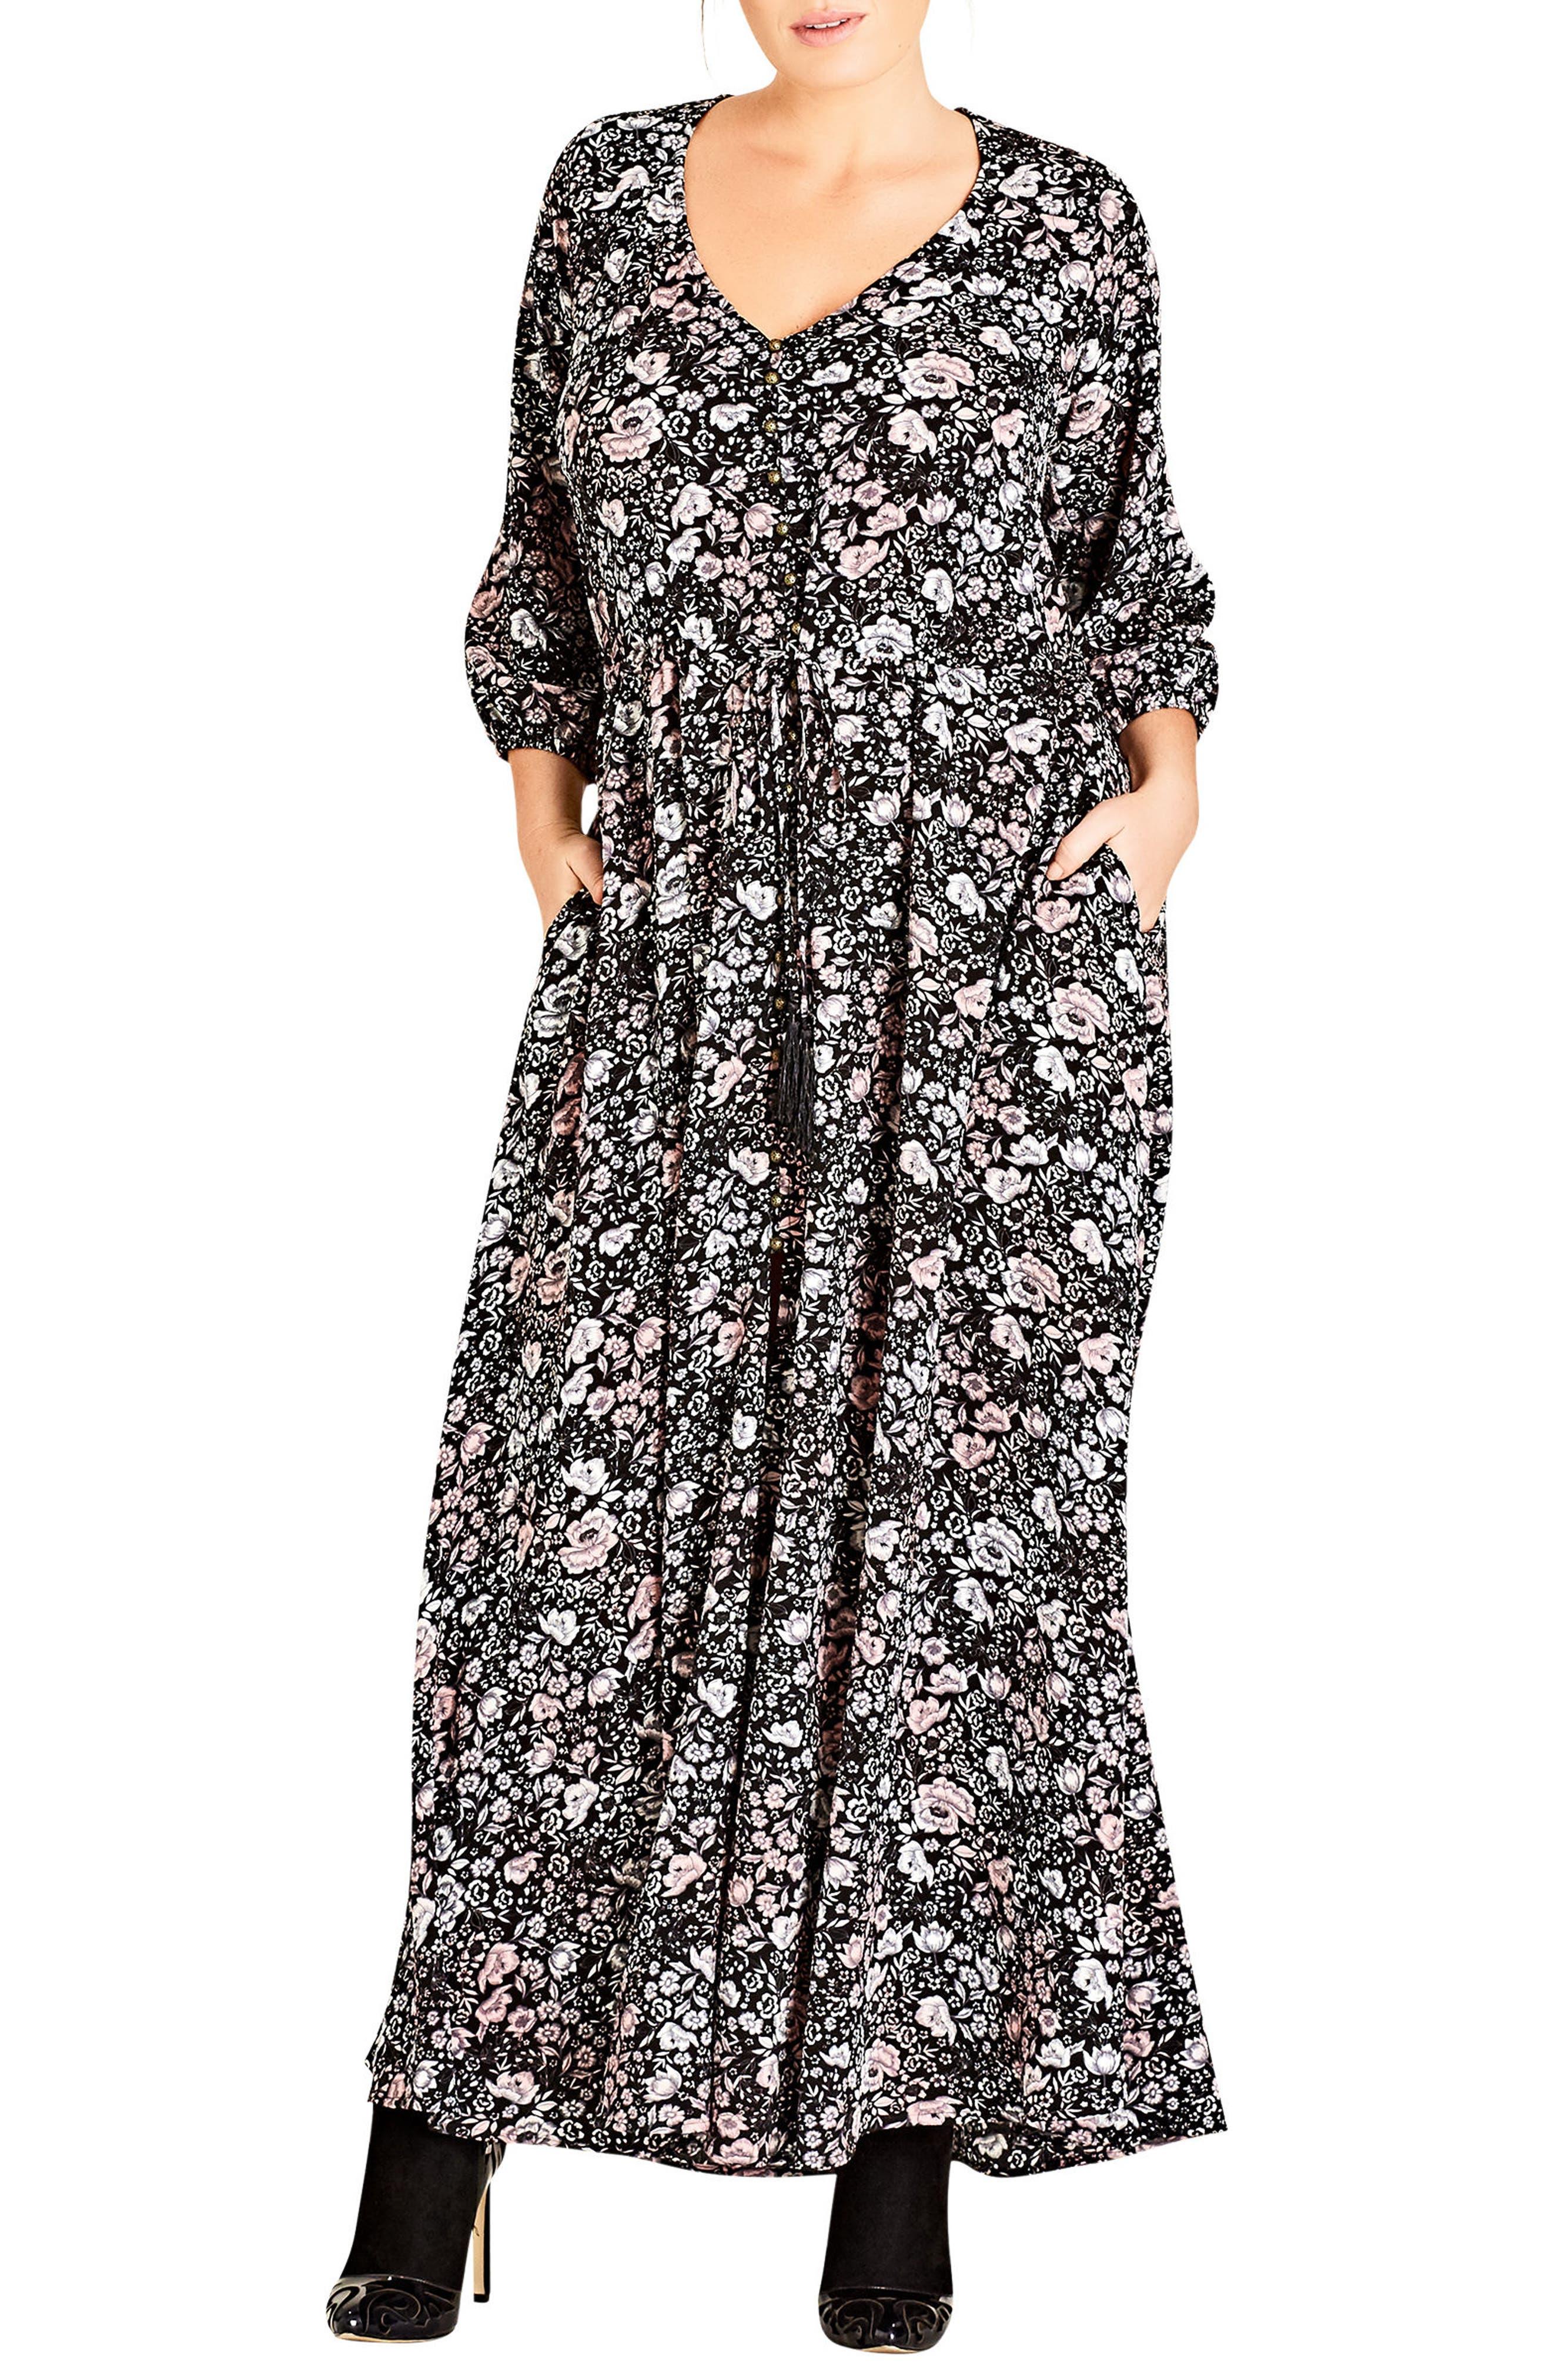 Etched Floral Maxi Dress,                         Main,                         color, Etched Floral